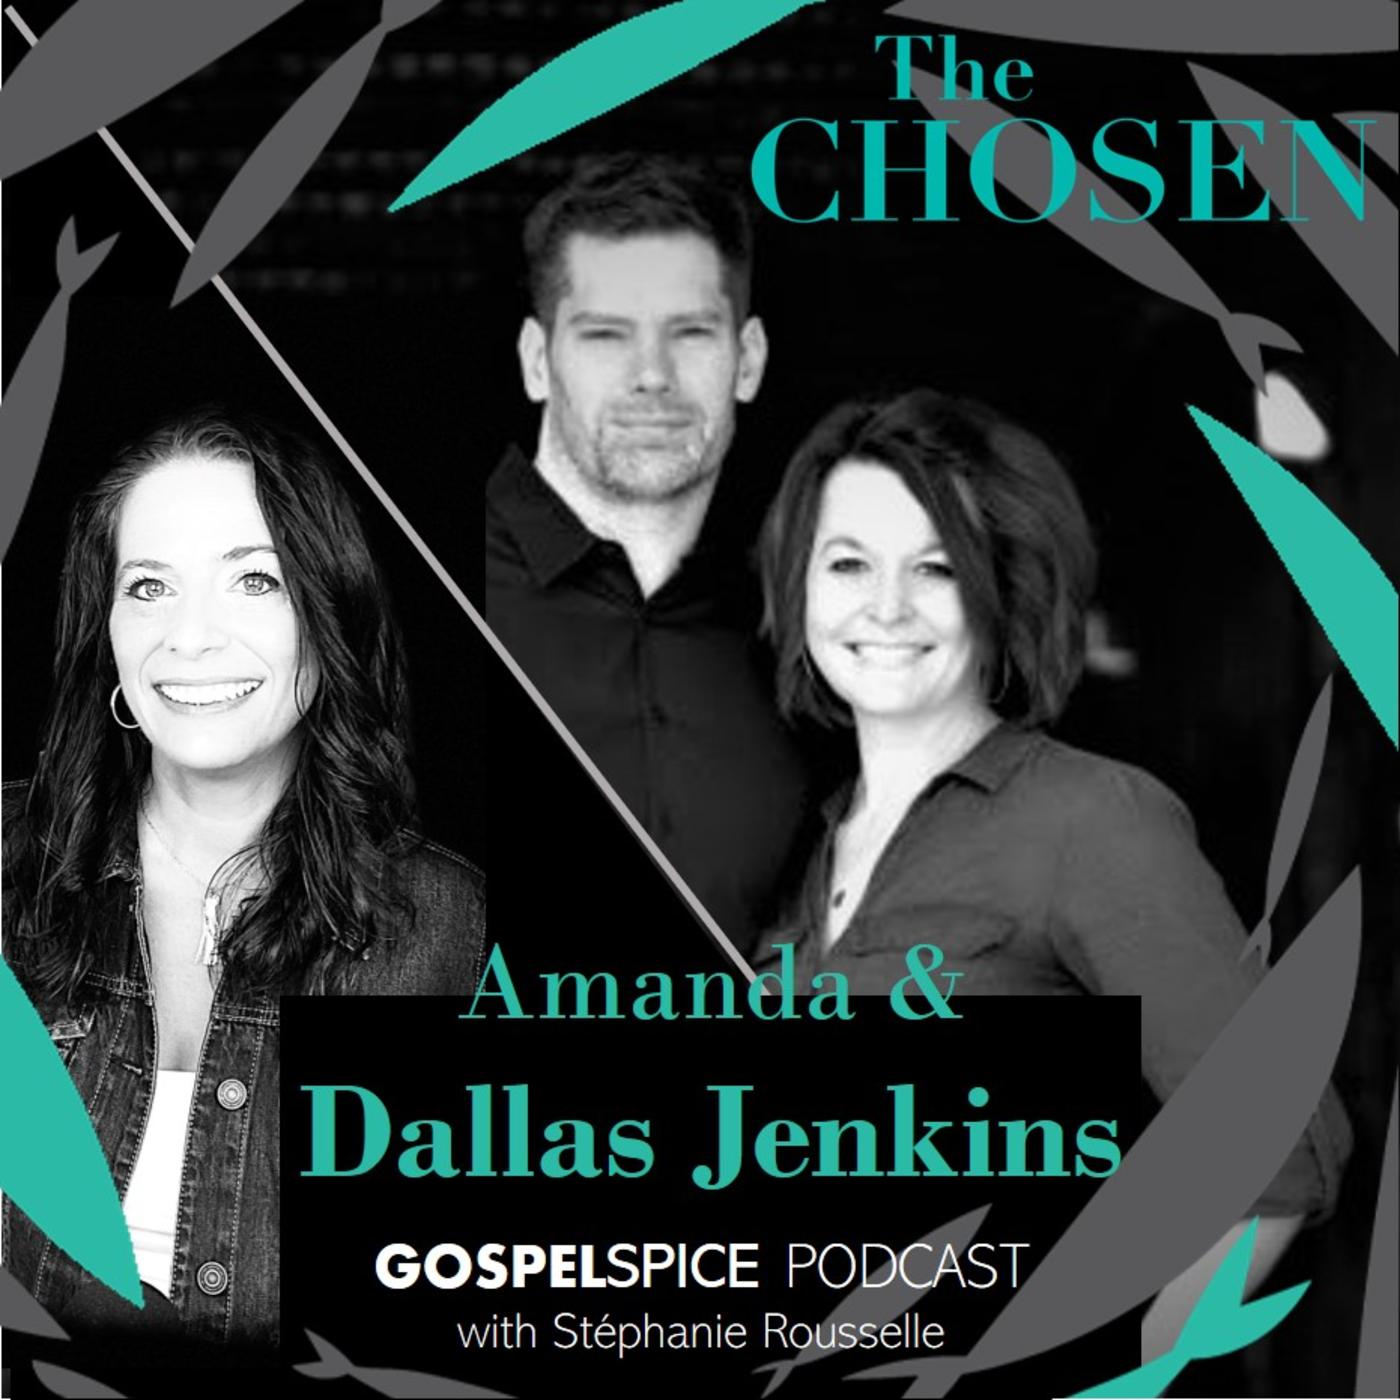 Amanda & Dallas Jenkins | The Chosen: taste & see the spice of the gospel!